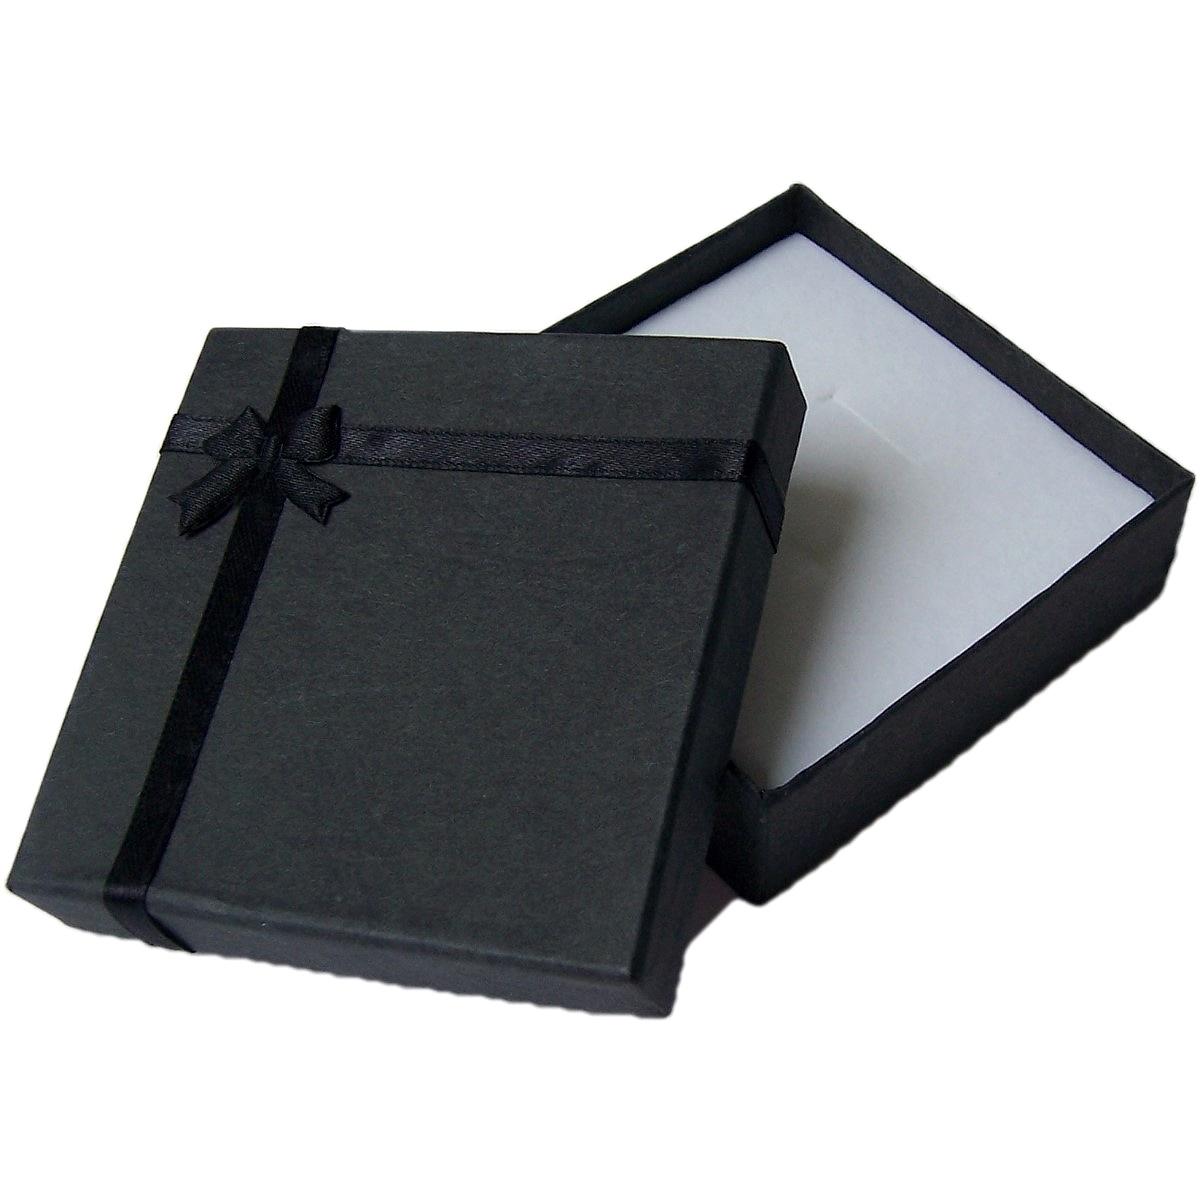 G4013 Geschenkbox Schmuckkästchen Geschenk Etui 9x9cm dunkelgrau